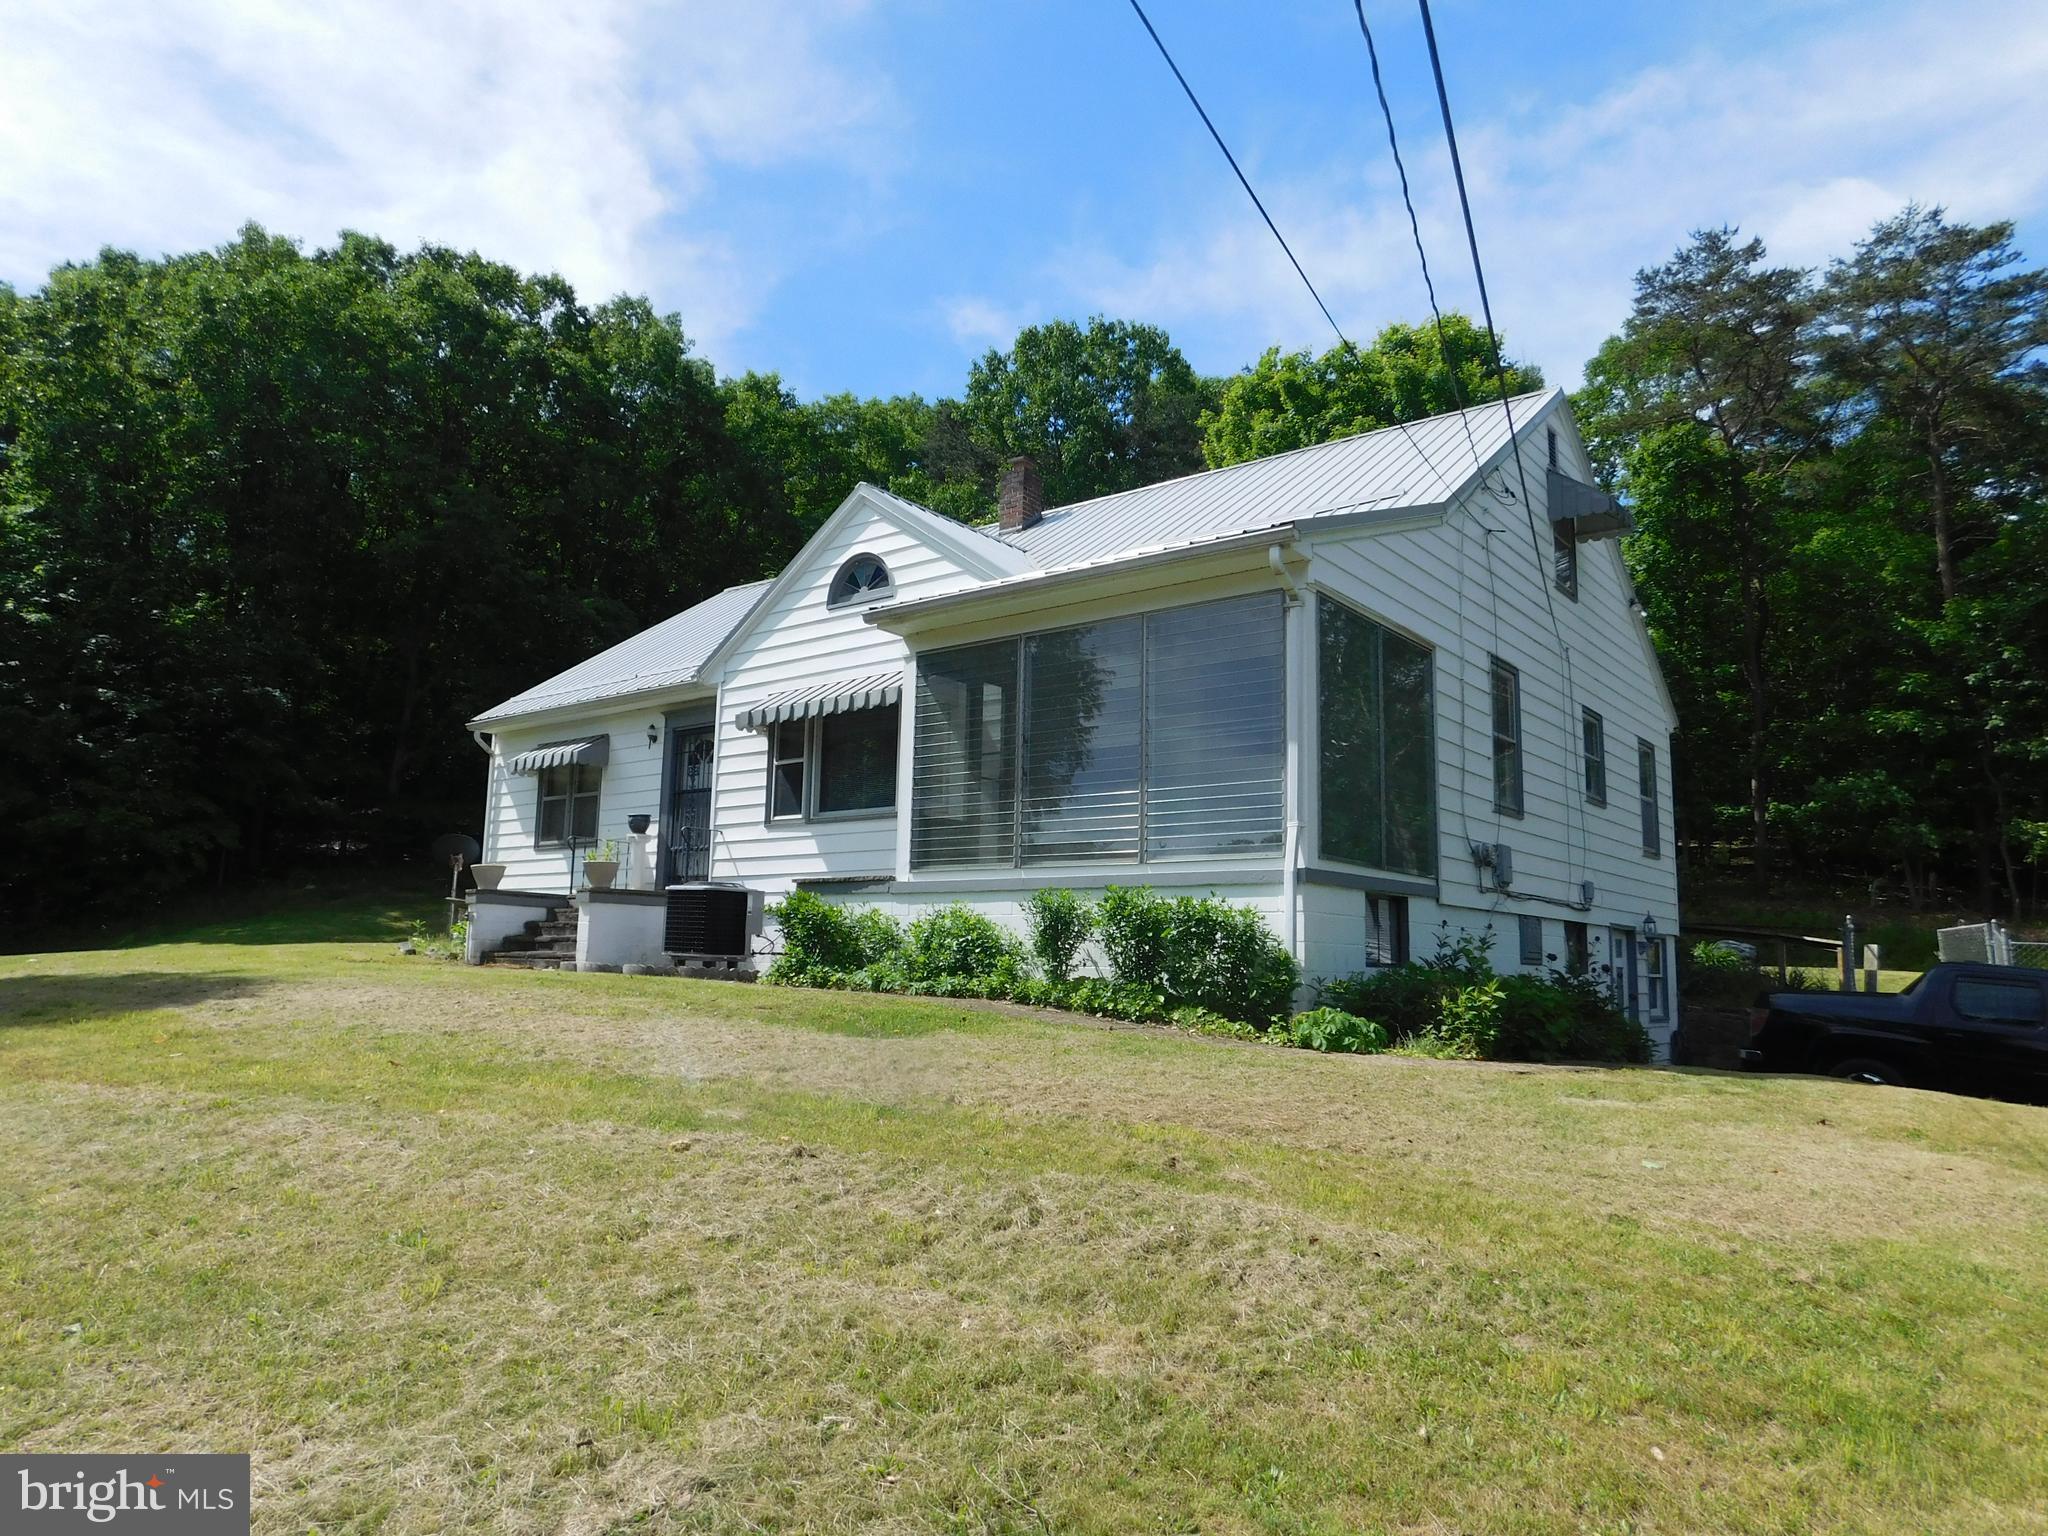 172 GRACE CABIN LANE, RIDGELEY, WV 26753